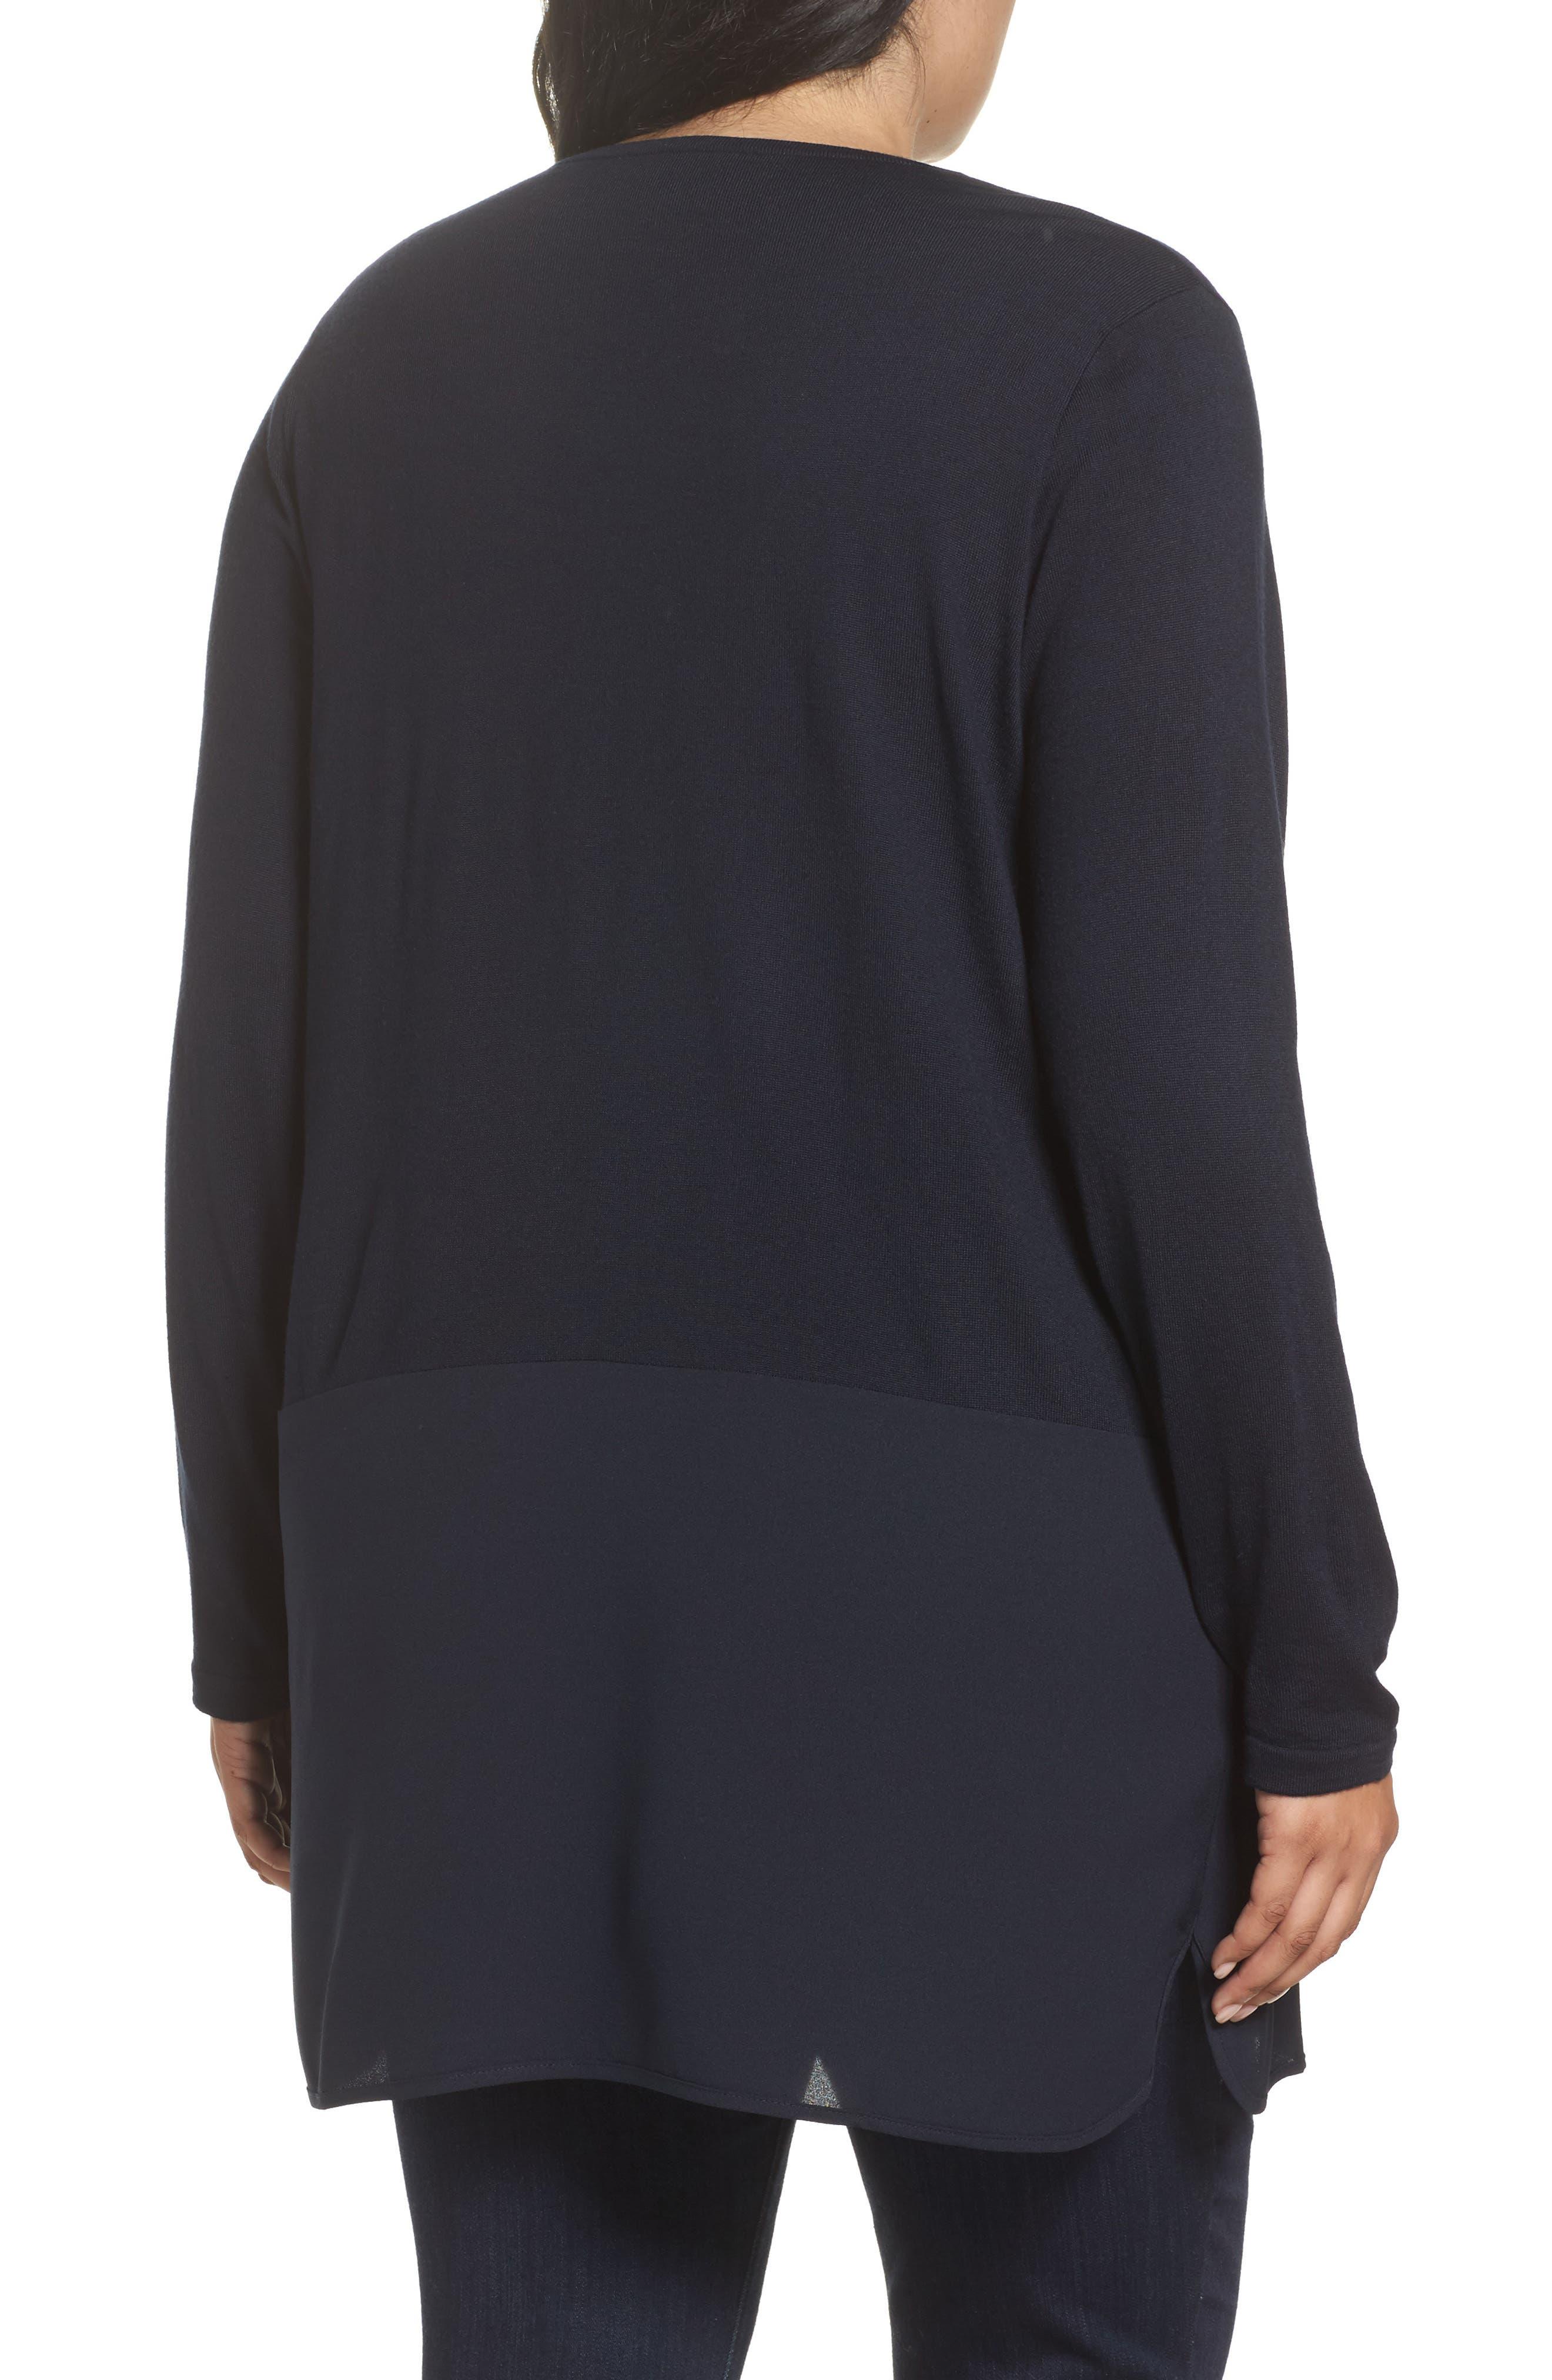 Adamo MIxed Media Sweater,                             Alternate thumbnail 2, color,                             411